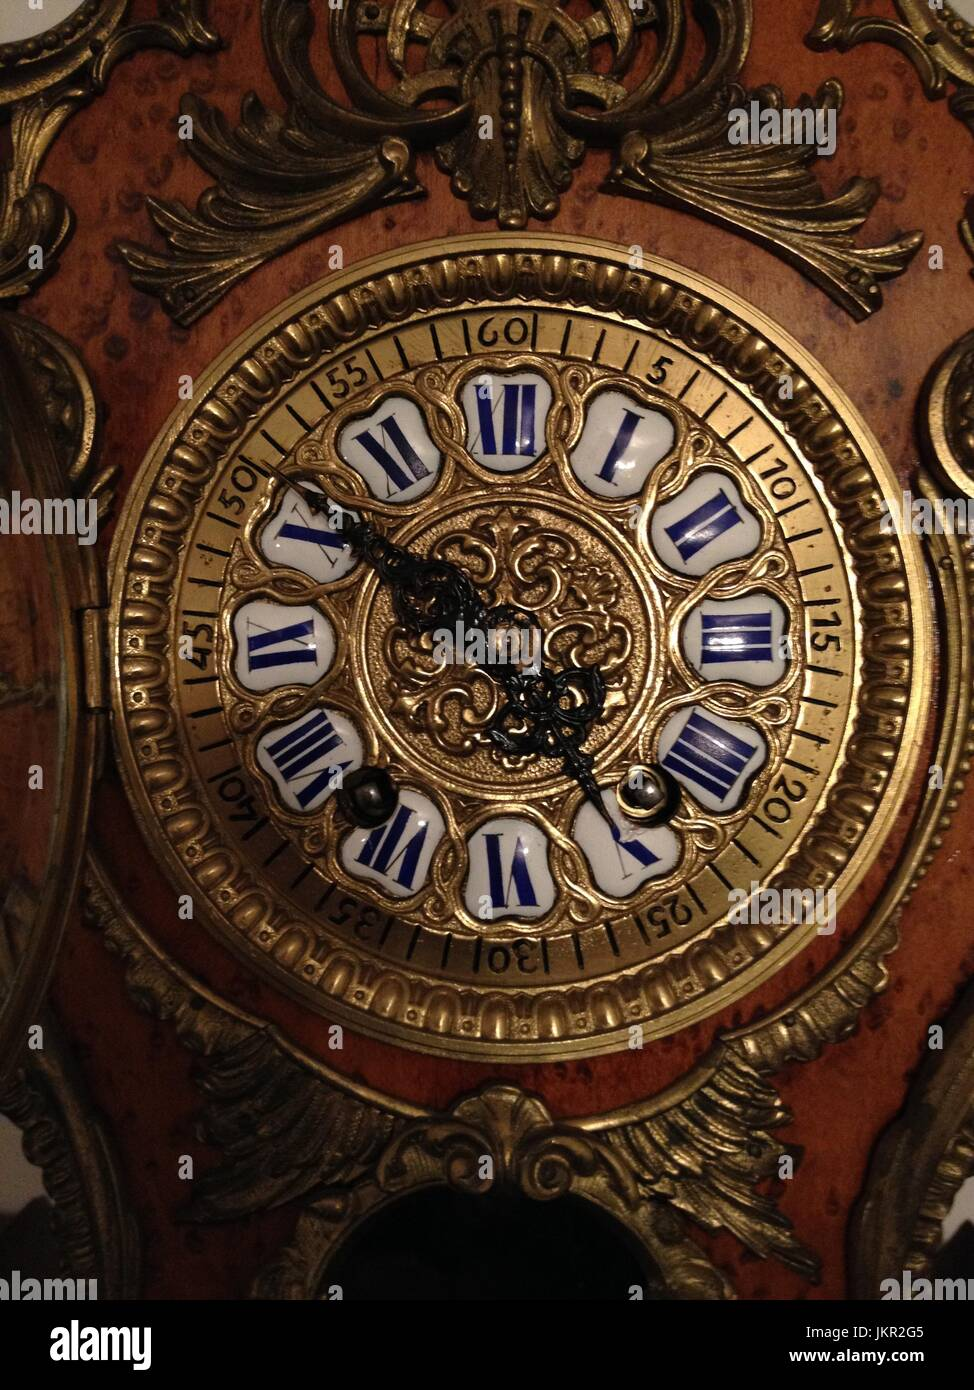 Antique Clock Face - Stock Image